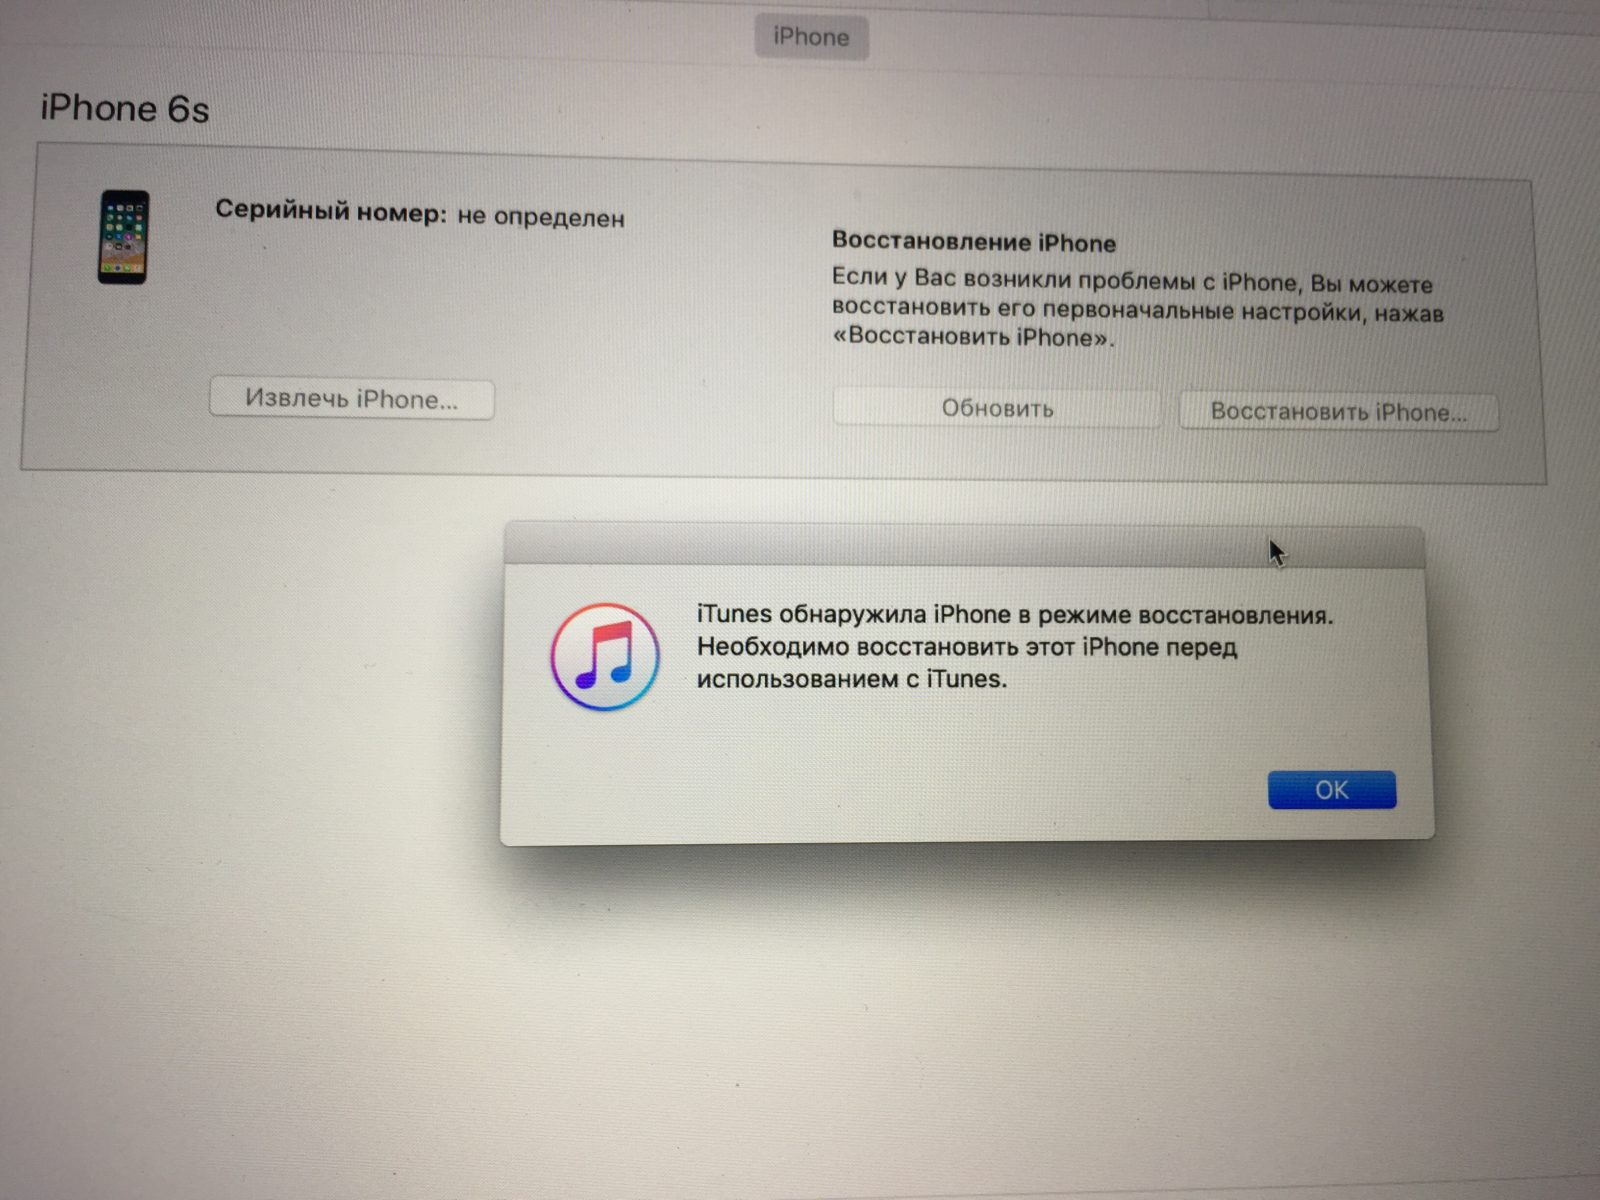 Решено. Ошибка: не удалось восстановить iPhone. Declined to authorize this image on this device for this user